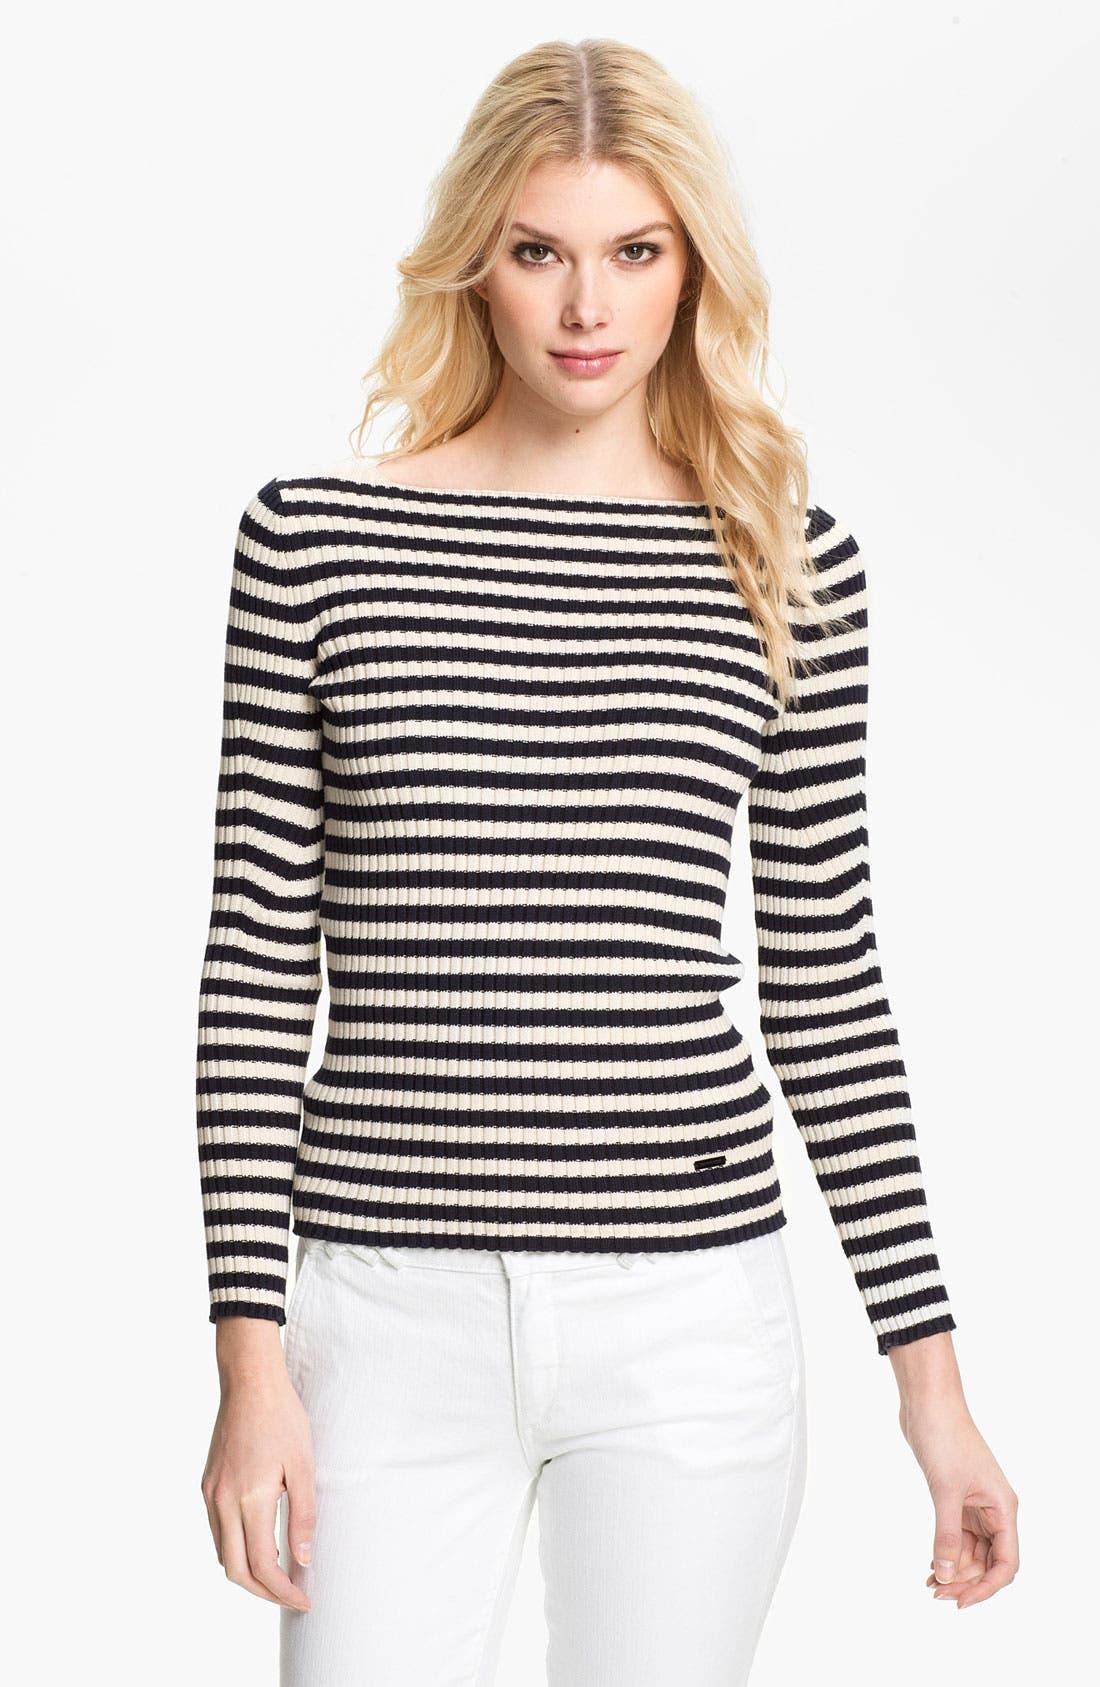 Main Image - Tory Burch 'Verona' Stripe Sweater